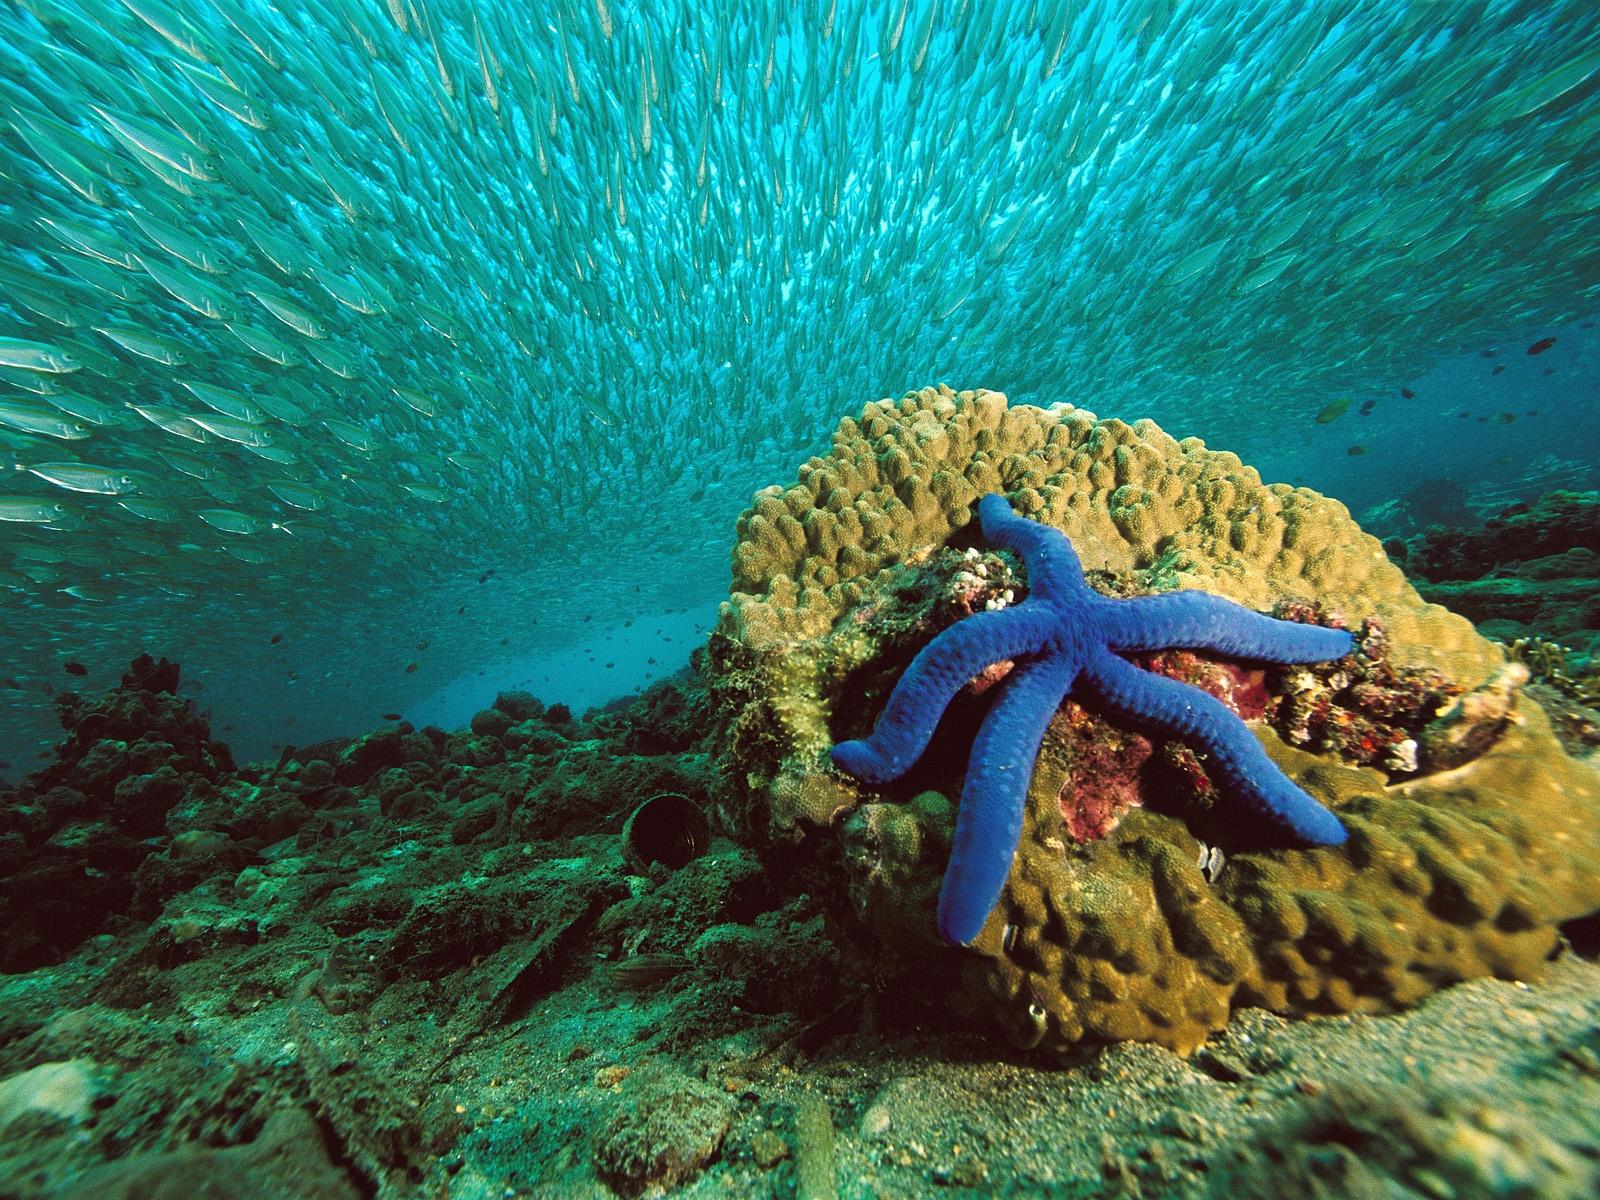 Blue Sea Star Wallpaper